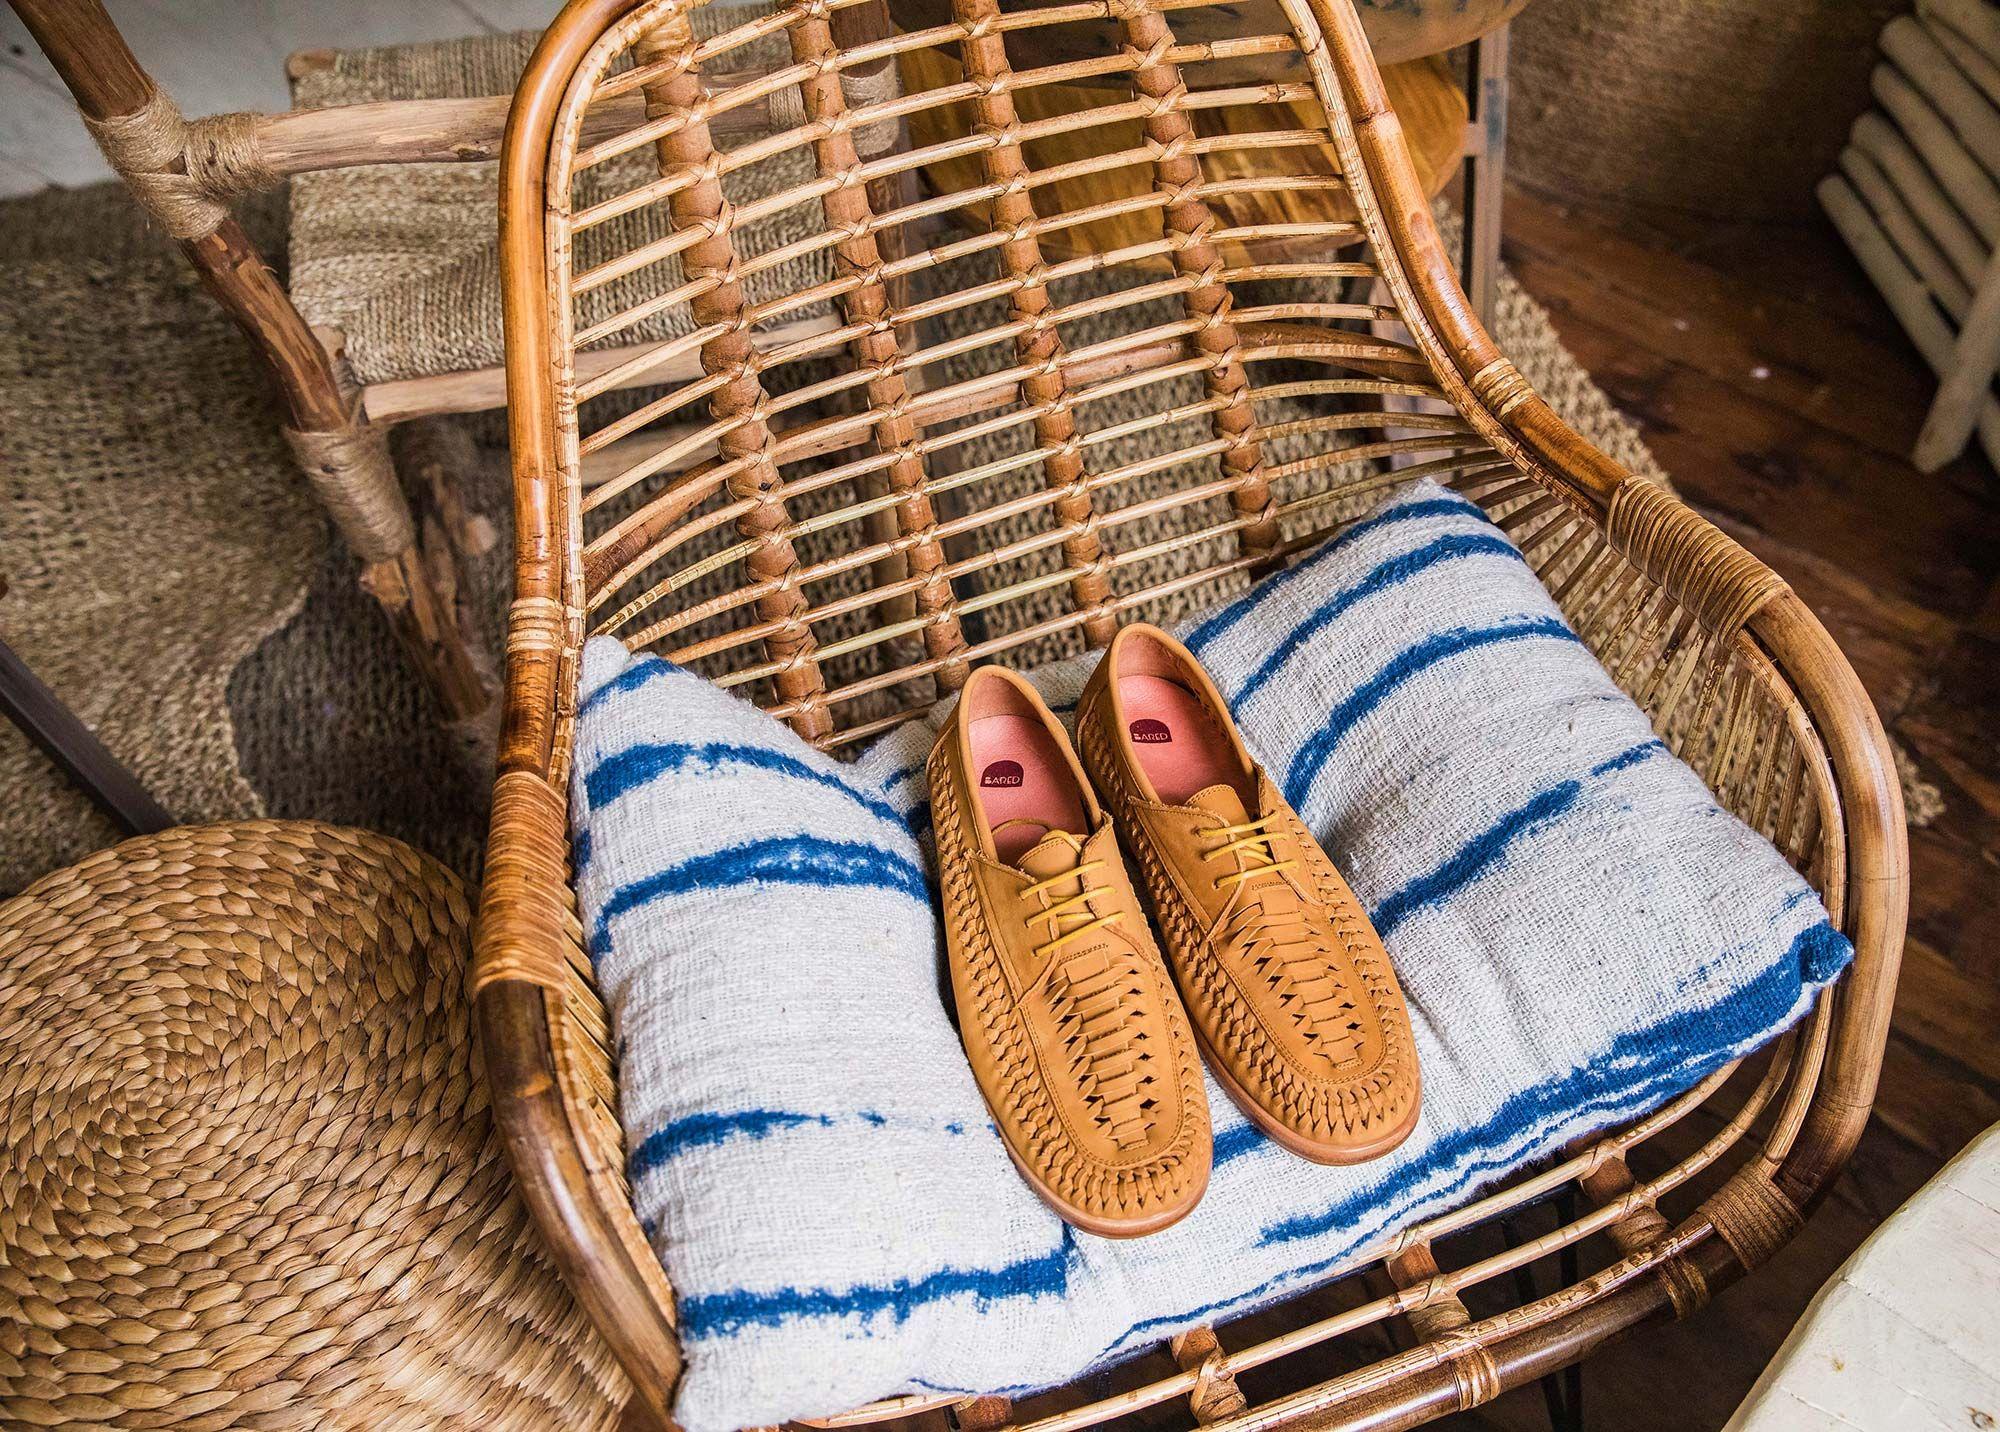 Bared_Footwear_La_Brisa_Bali_Travel_Summer_Mens_Campaign_Potassium_Desert_Nubuck_Lace_Ups